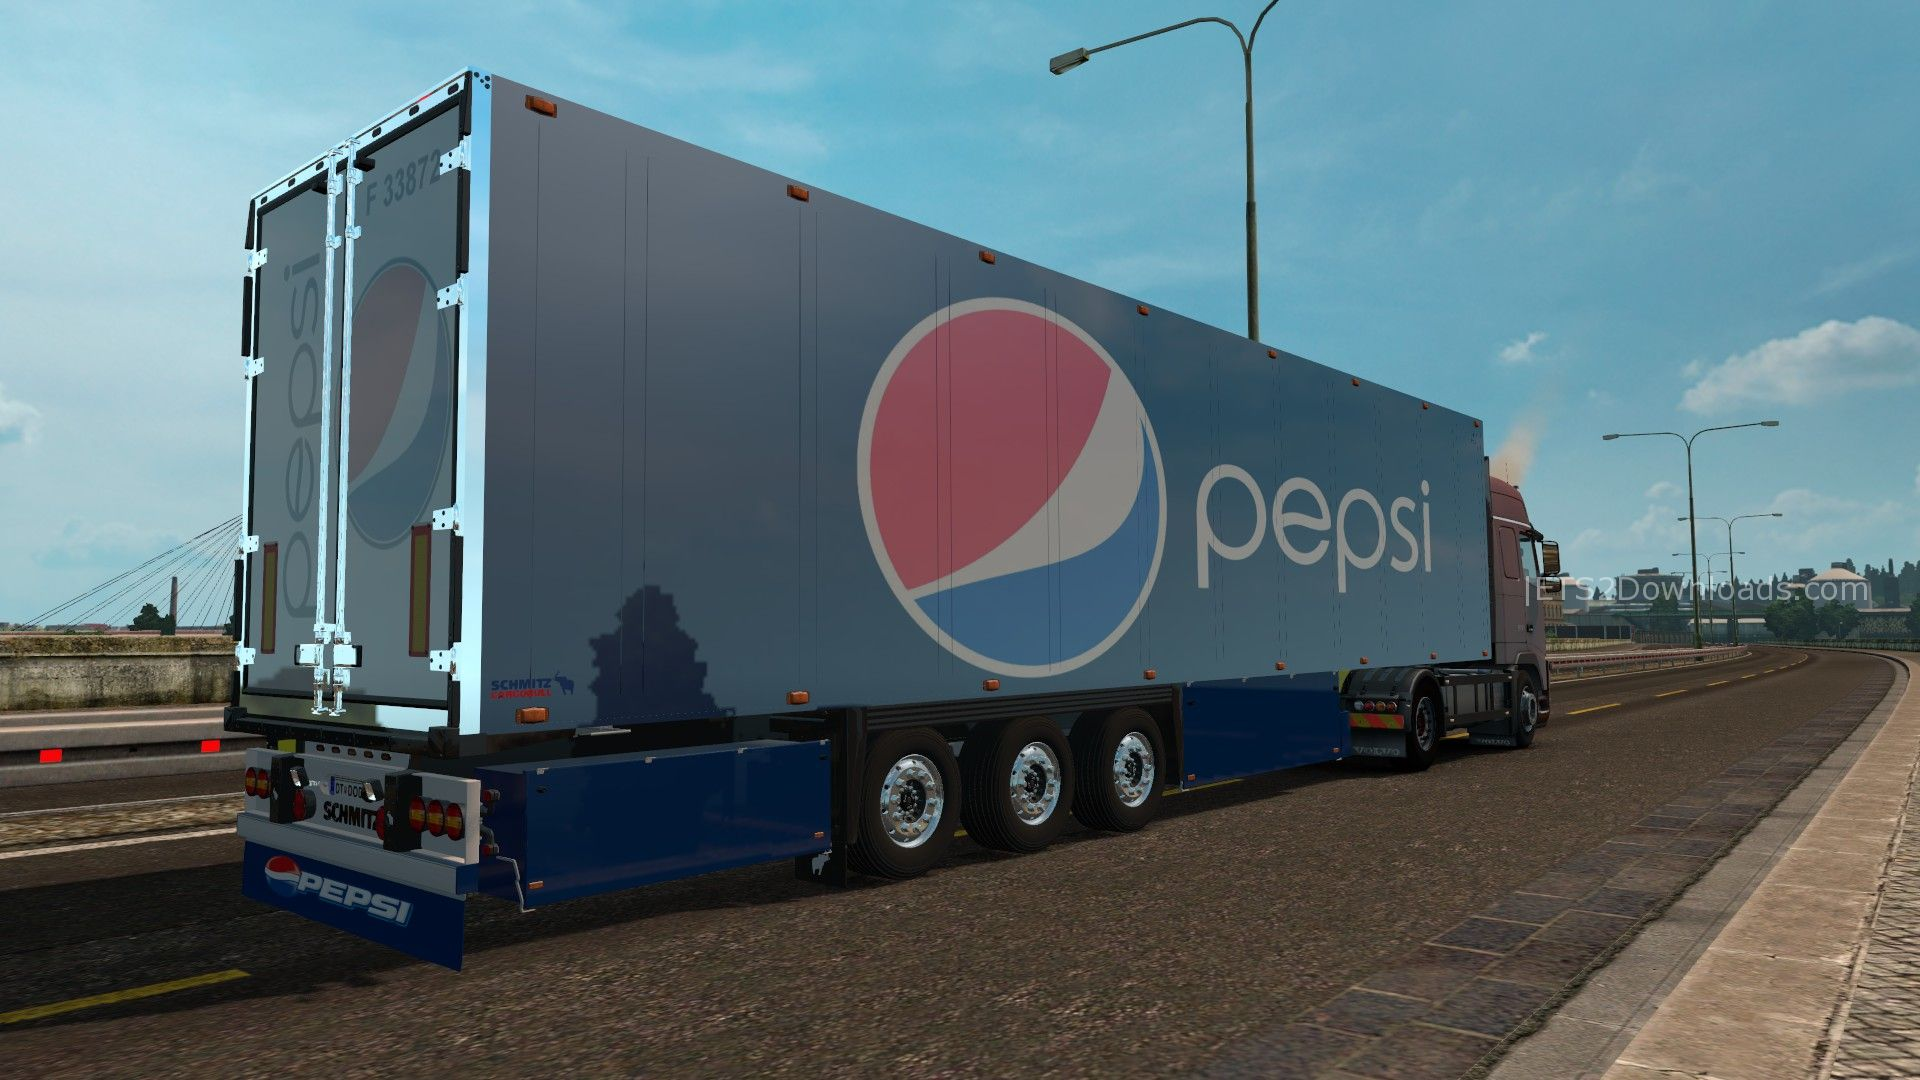 schmitz-pepsi-trailer